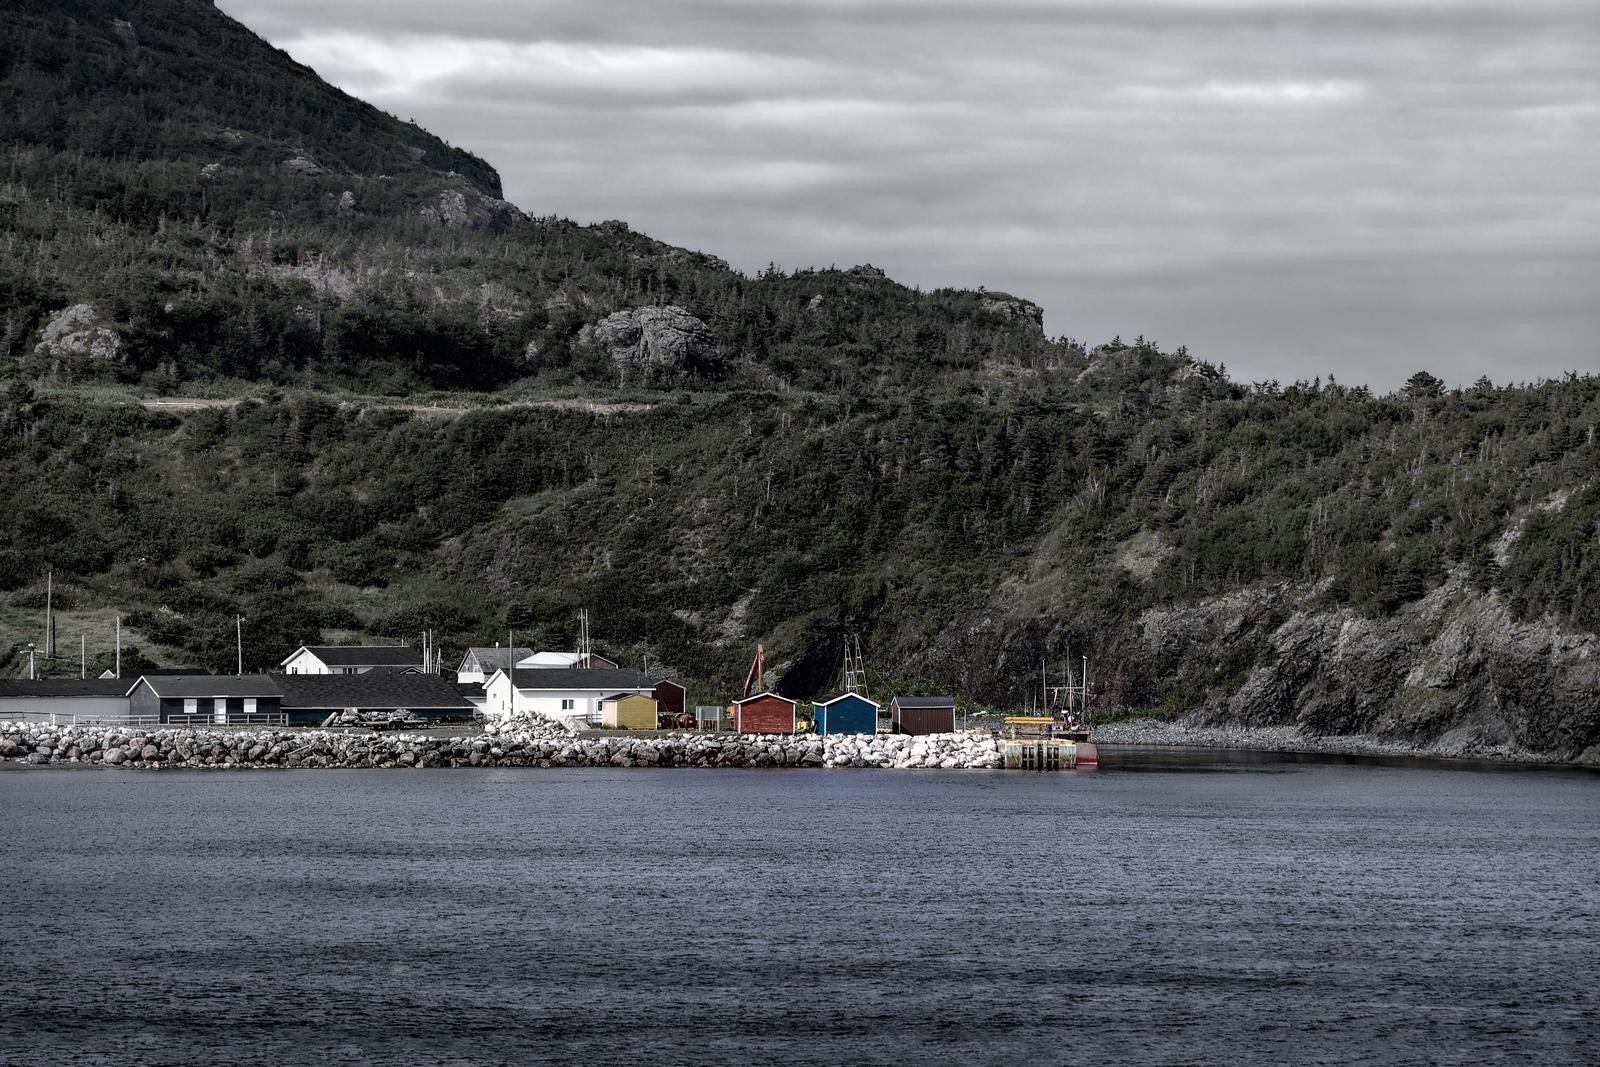 Fishing Shacks, Trout River, Newfoundland